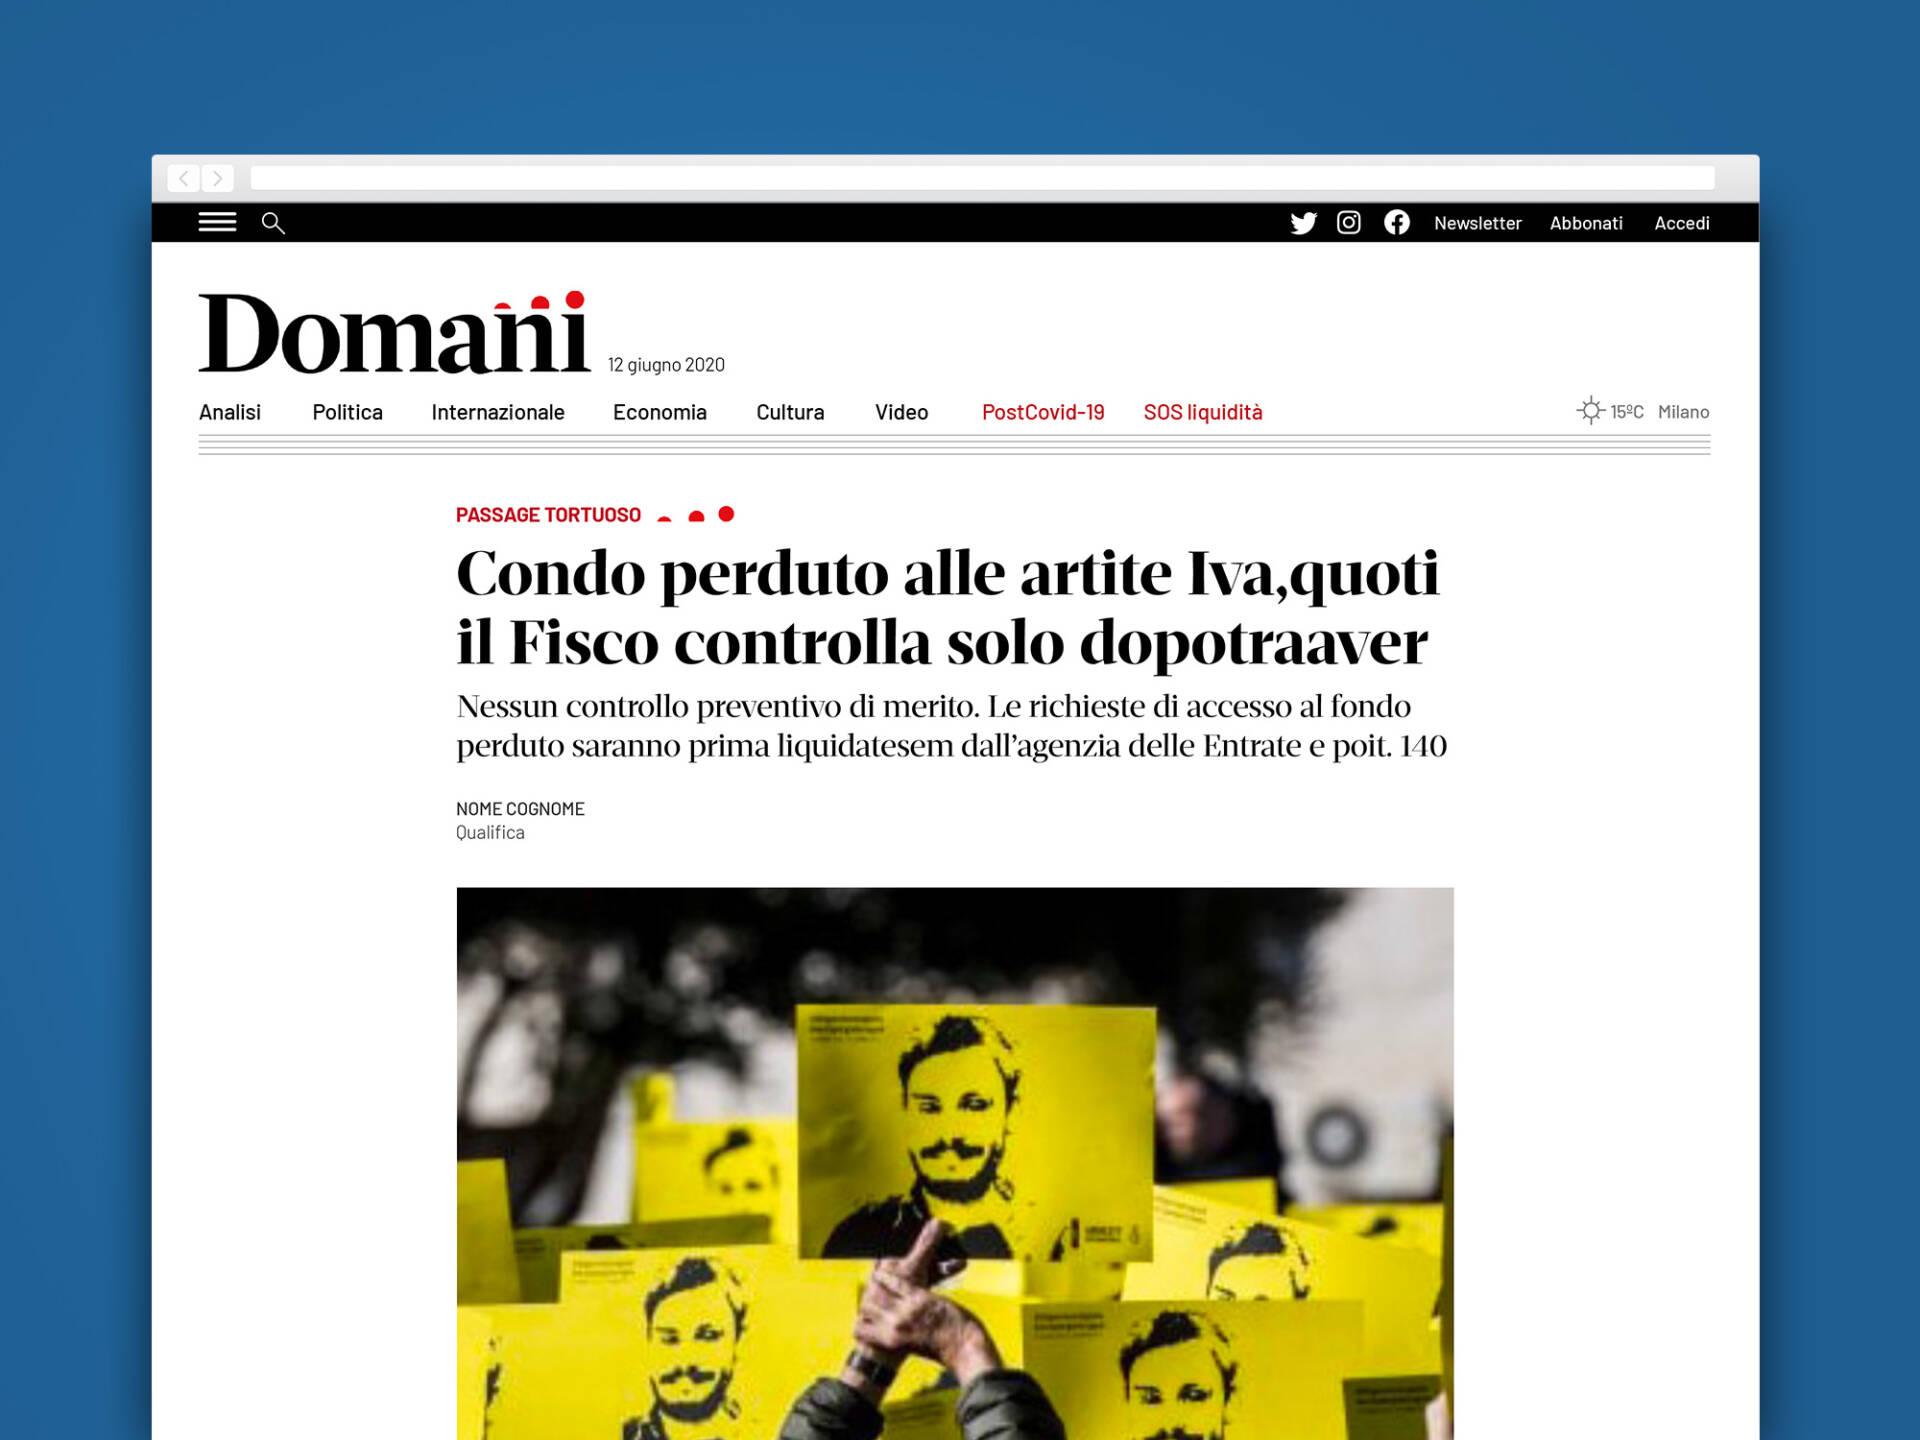 Domani_Web_Wenceslau_News_Design_6